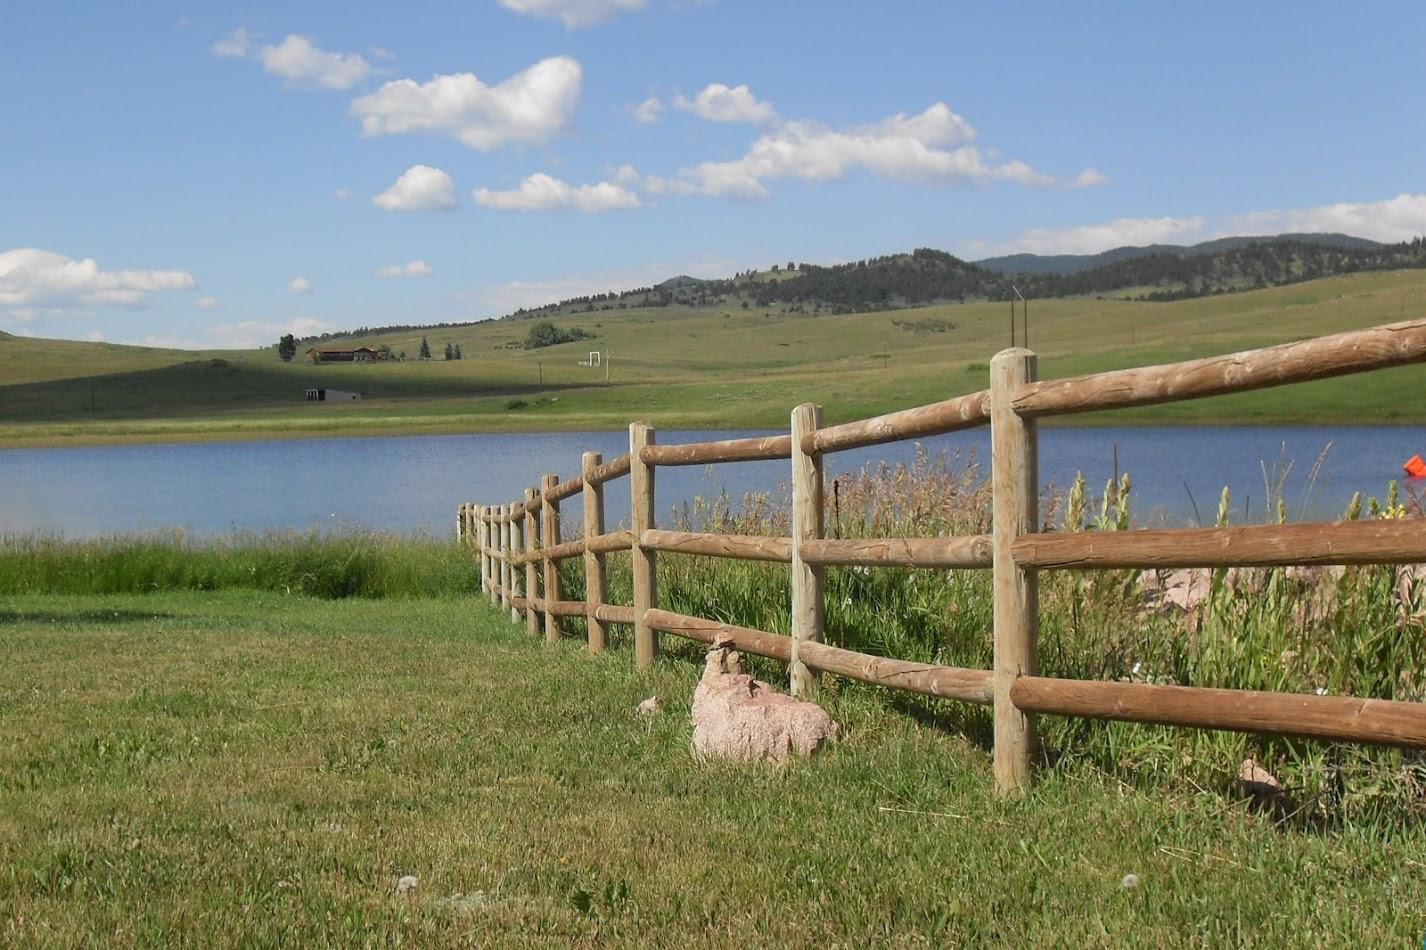 Image 12: Pinewood Reservoir